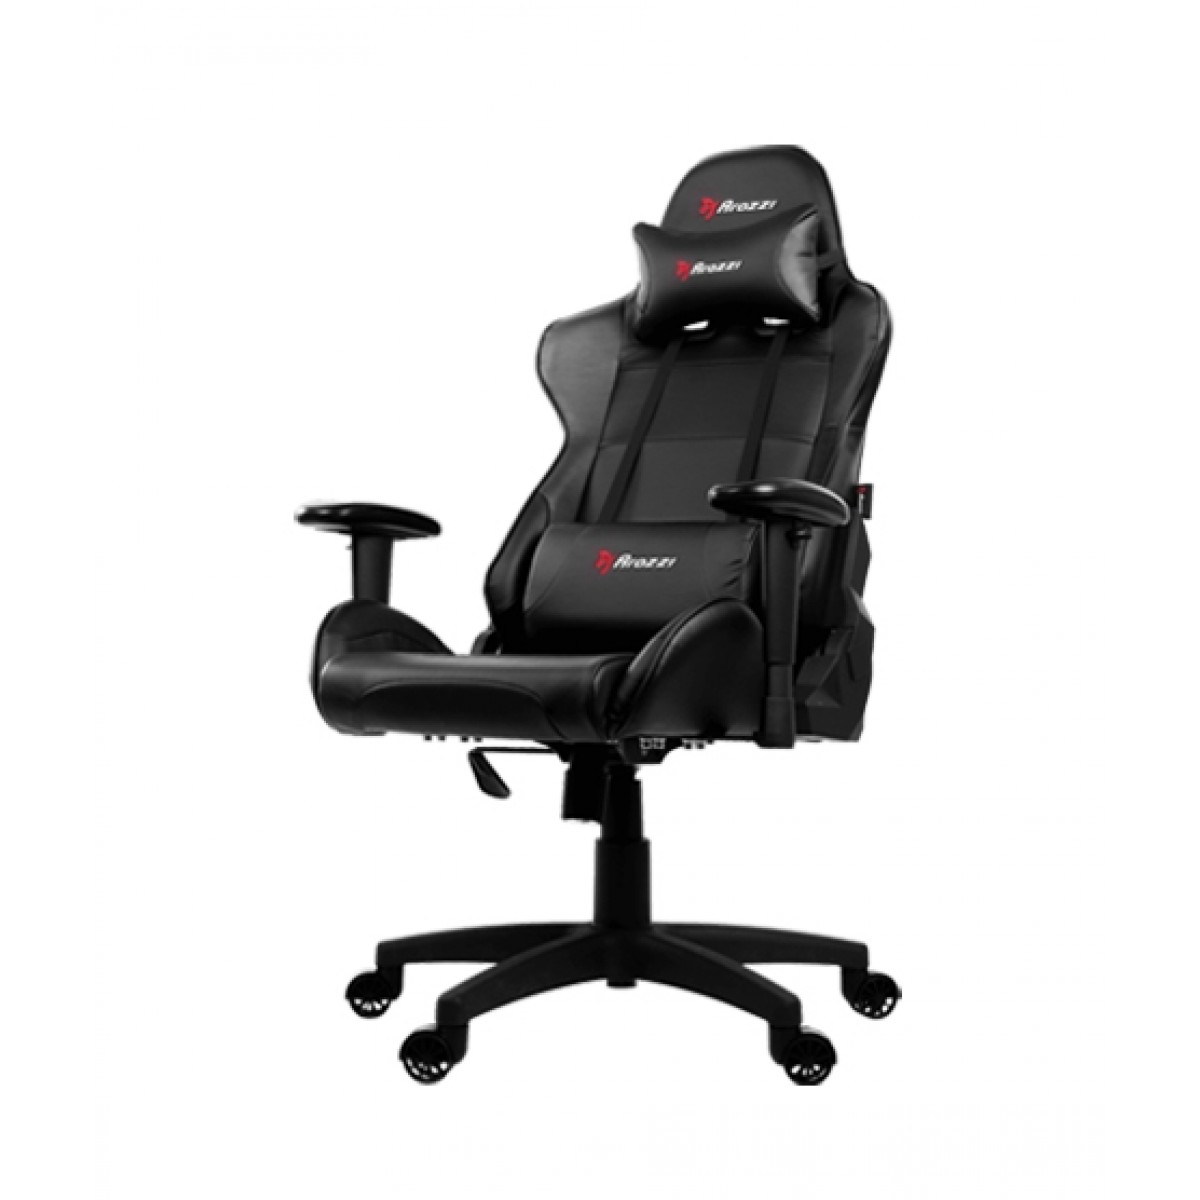 Strange Arozzi Verona V2 Gaming Chair Black Machost Co Dining Chair Design Ideas Machostcouk